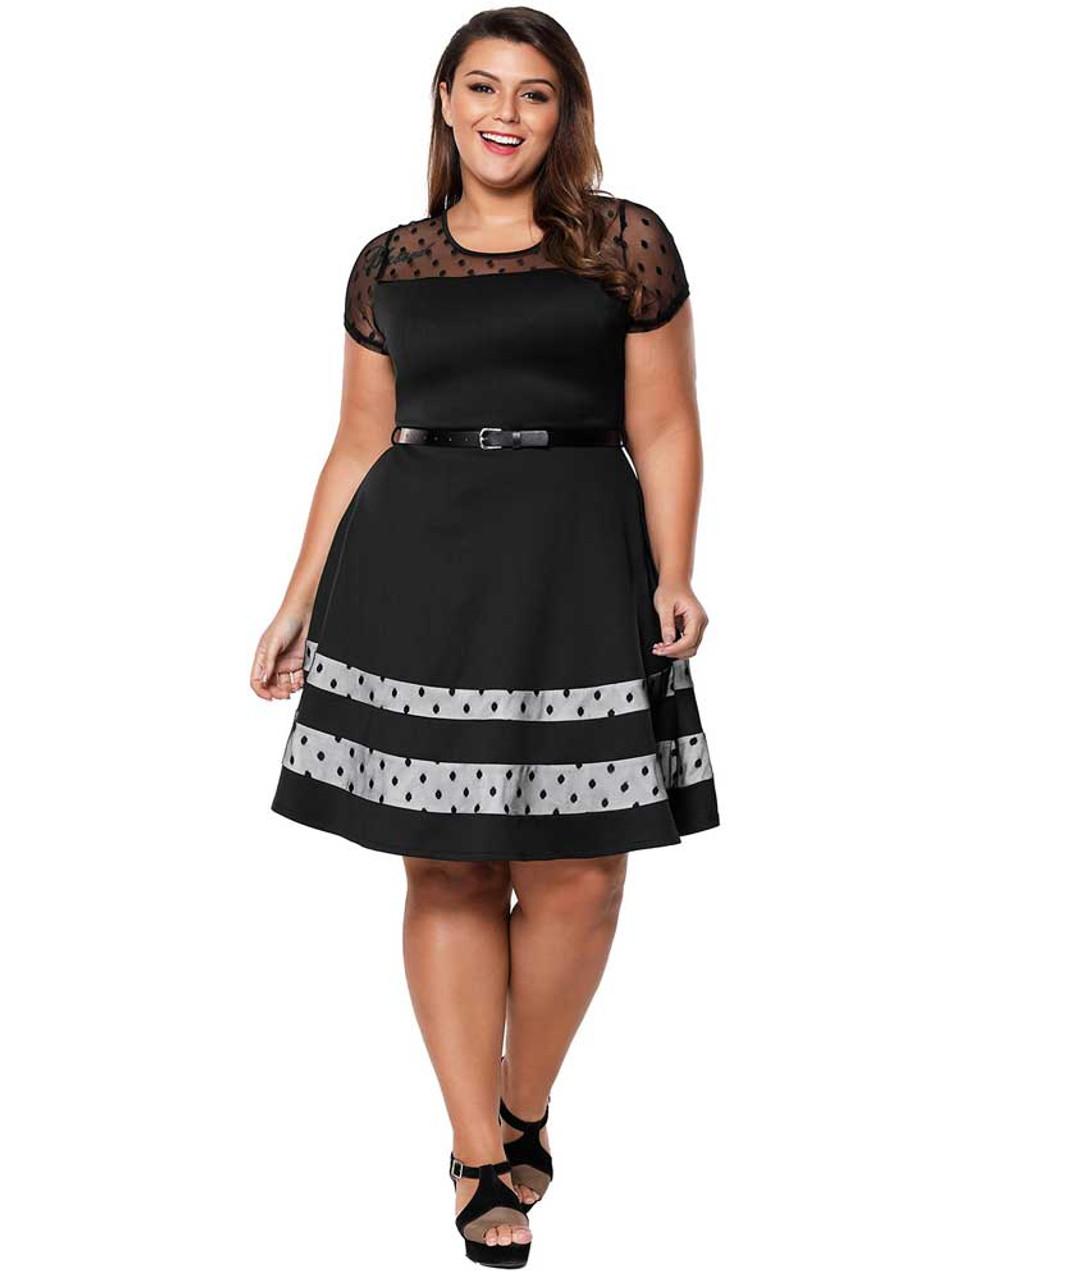 Black dot hollow mesh neck plus size mini dress